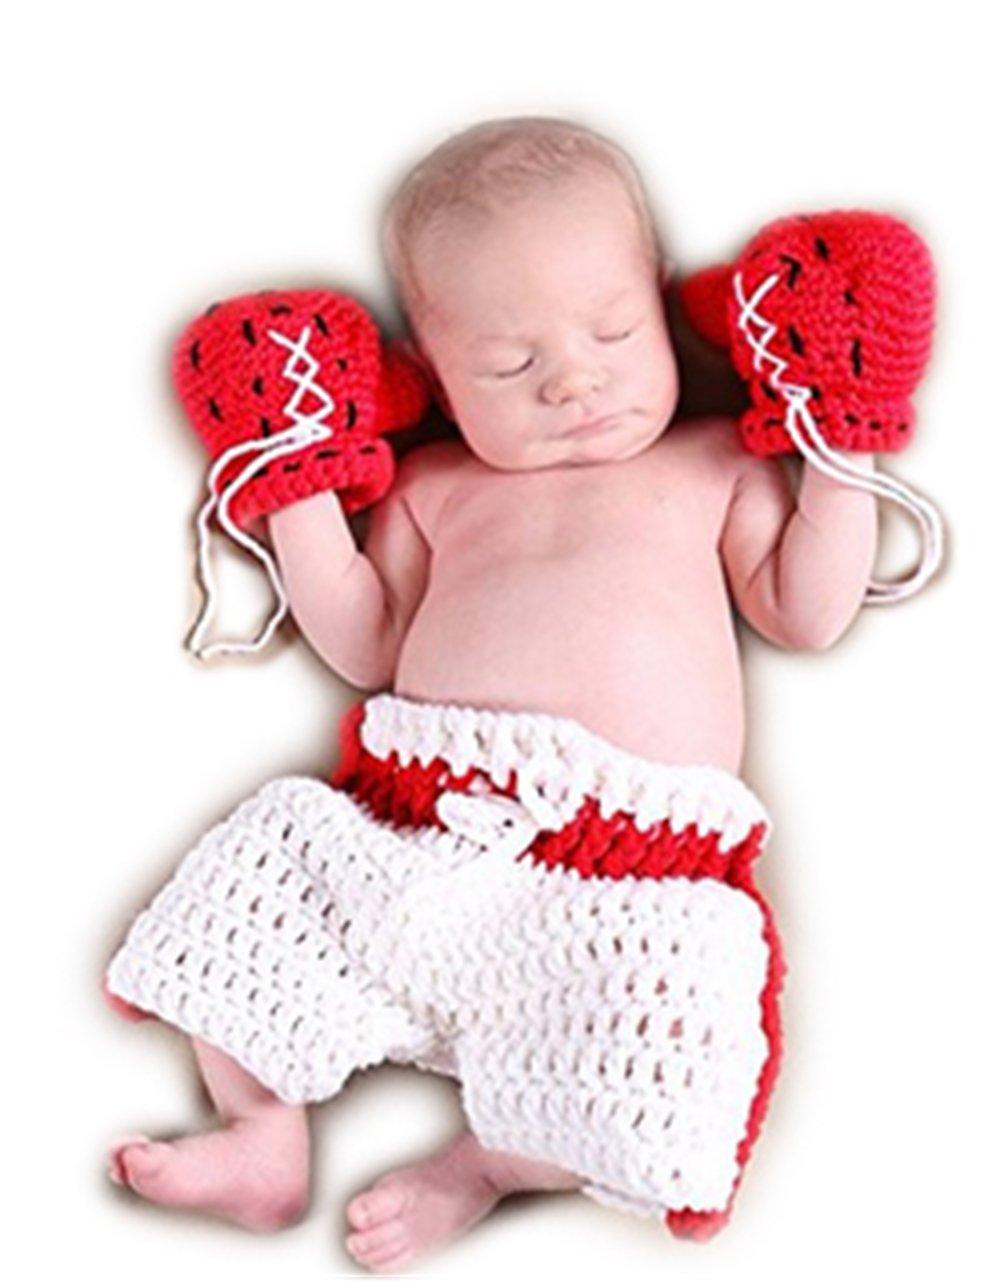 Handmade Infant Newborn Baby Girl Boy Crochet Knit Champion K.O Gloves Shorts Photography Props Outfits Costume Auberllus